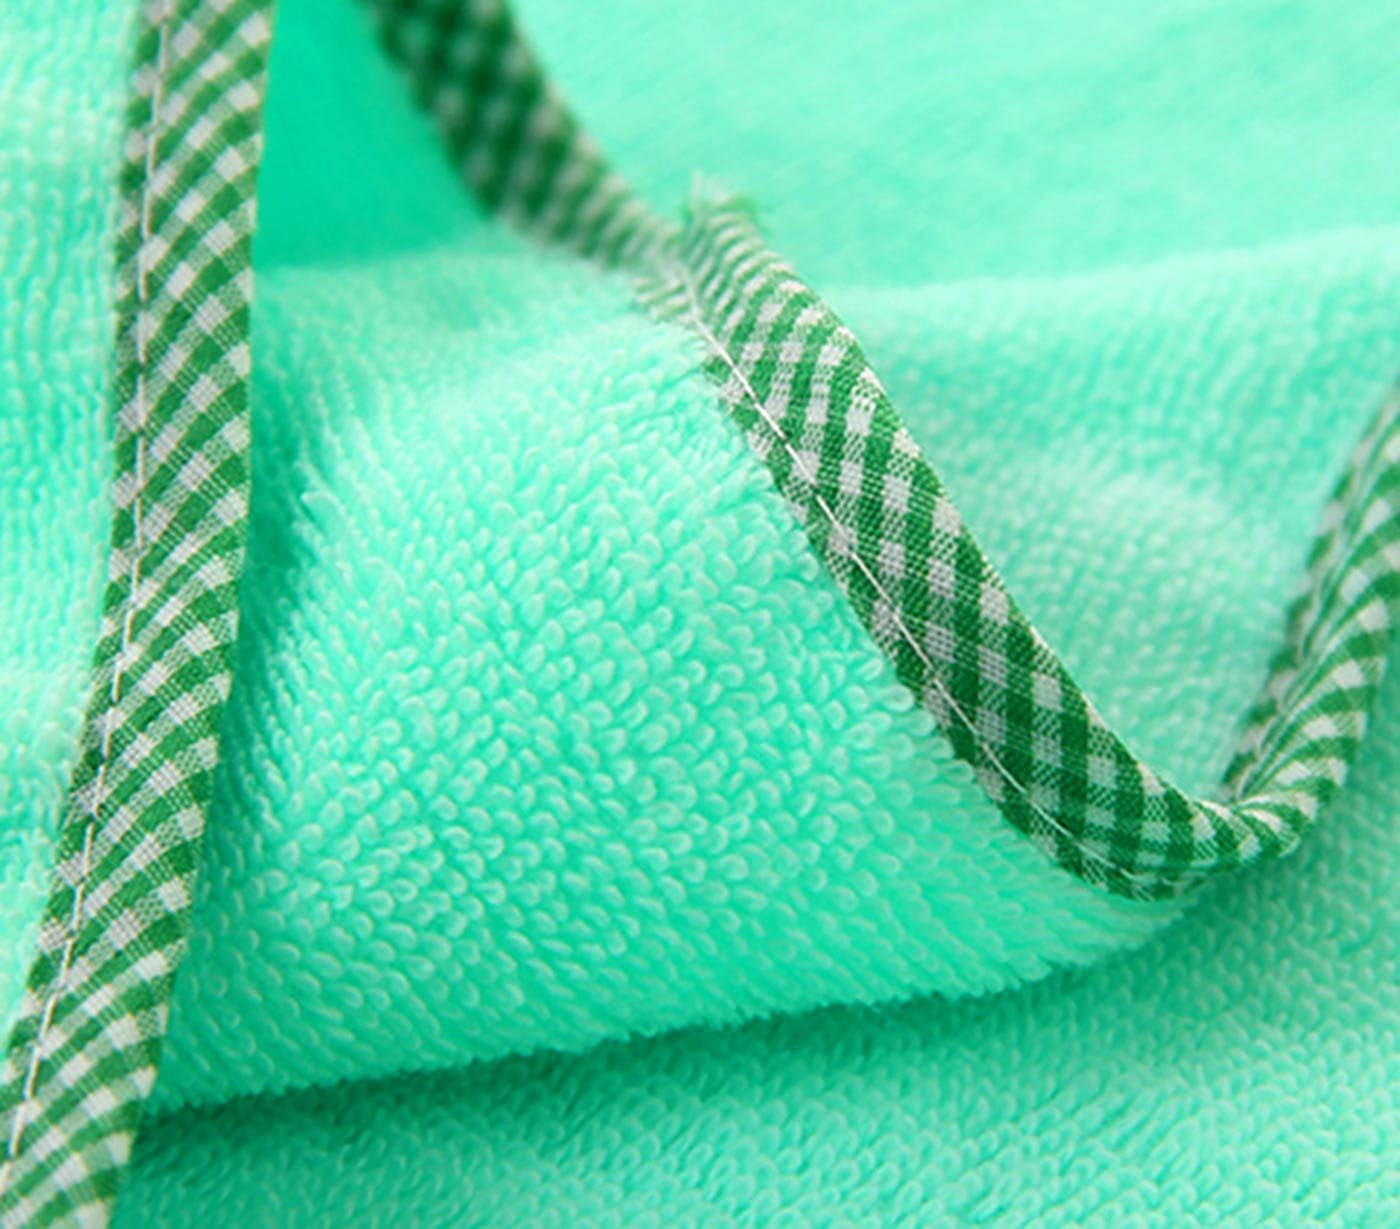 FEOYA Baby Bath Towel Terry Cotton Adorable Bear Hooded Washcloth